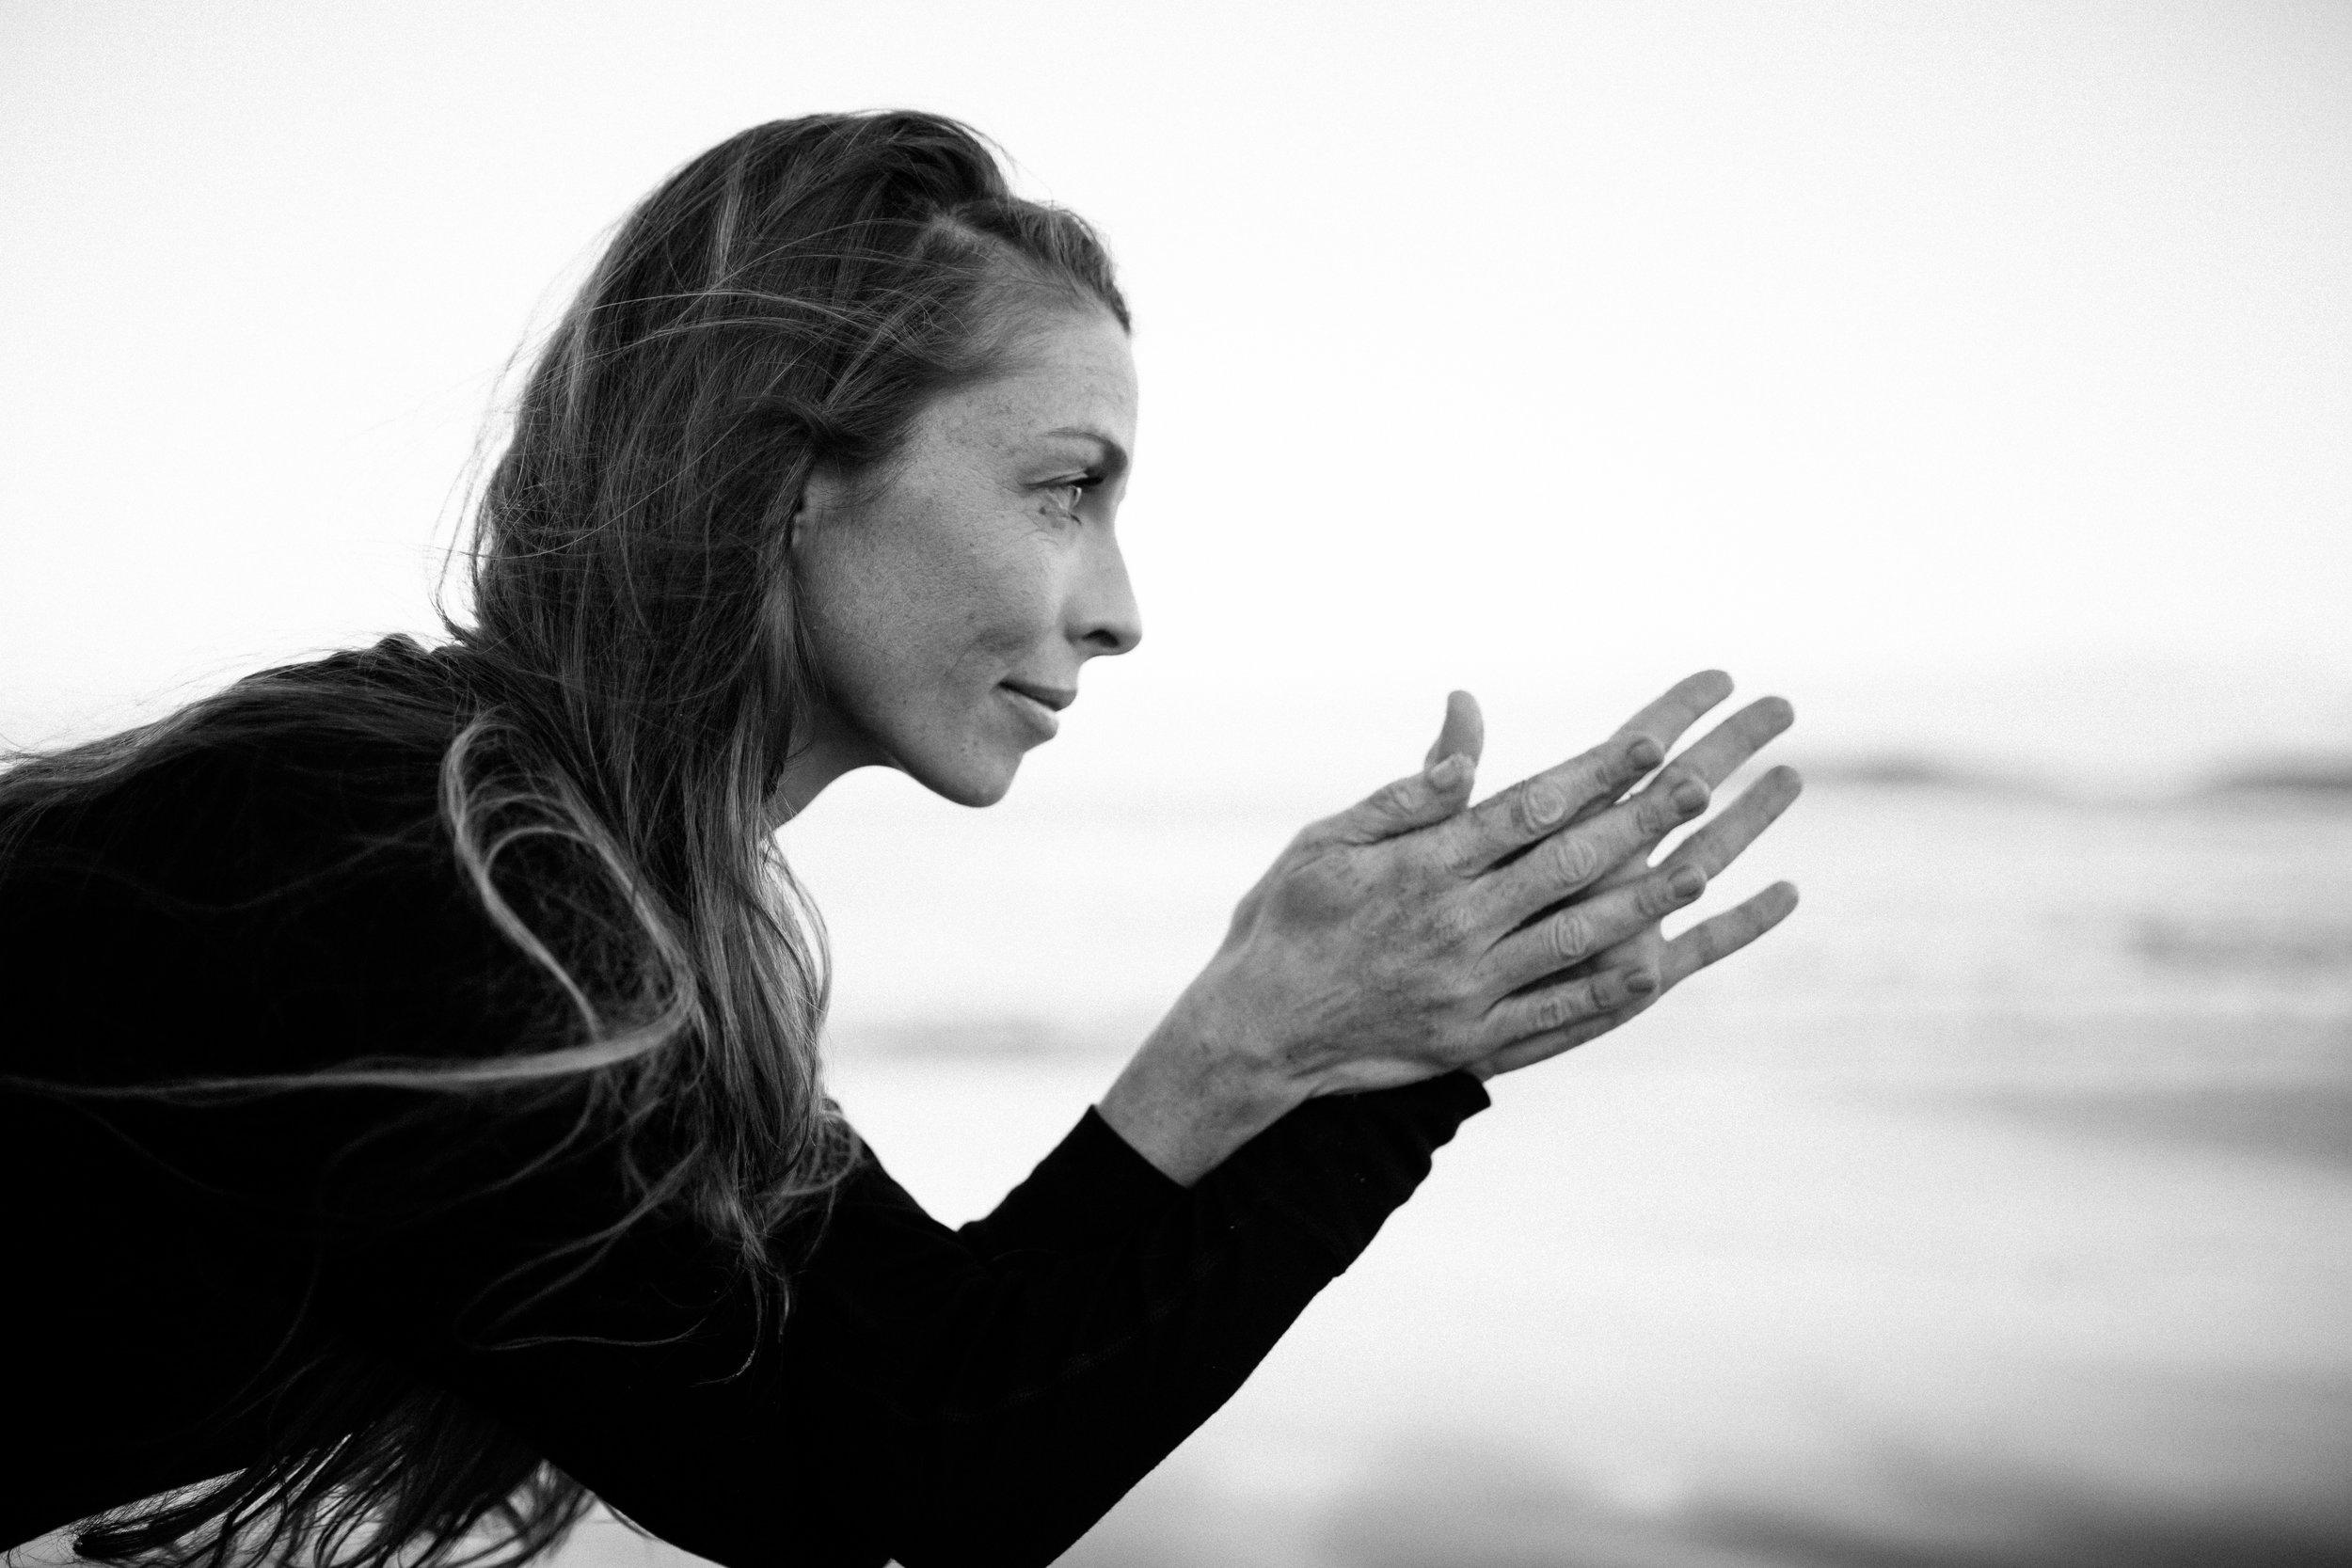 Lauren_Realph_YogaTherapy_Hara_Studio_Coffs_Harbour